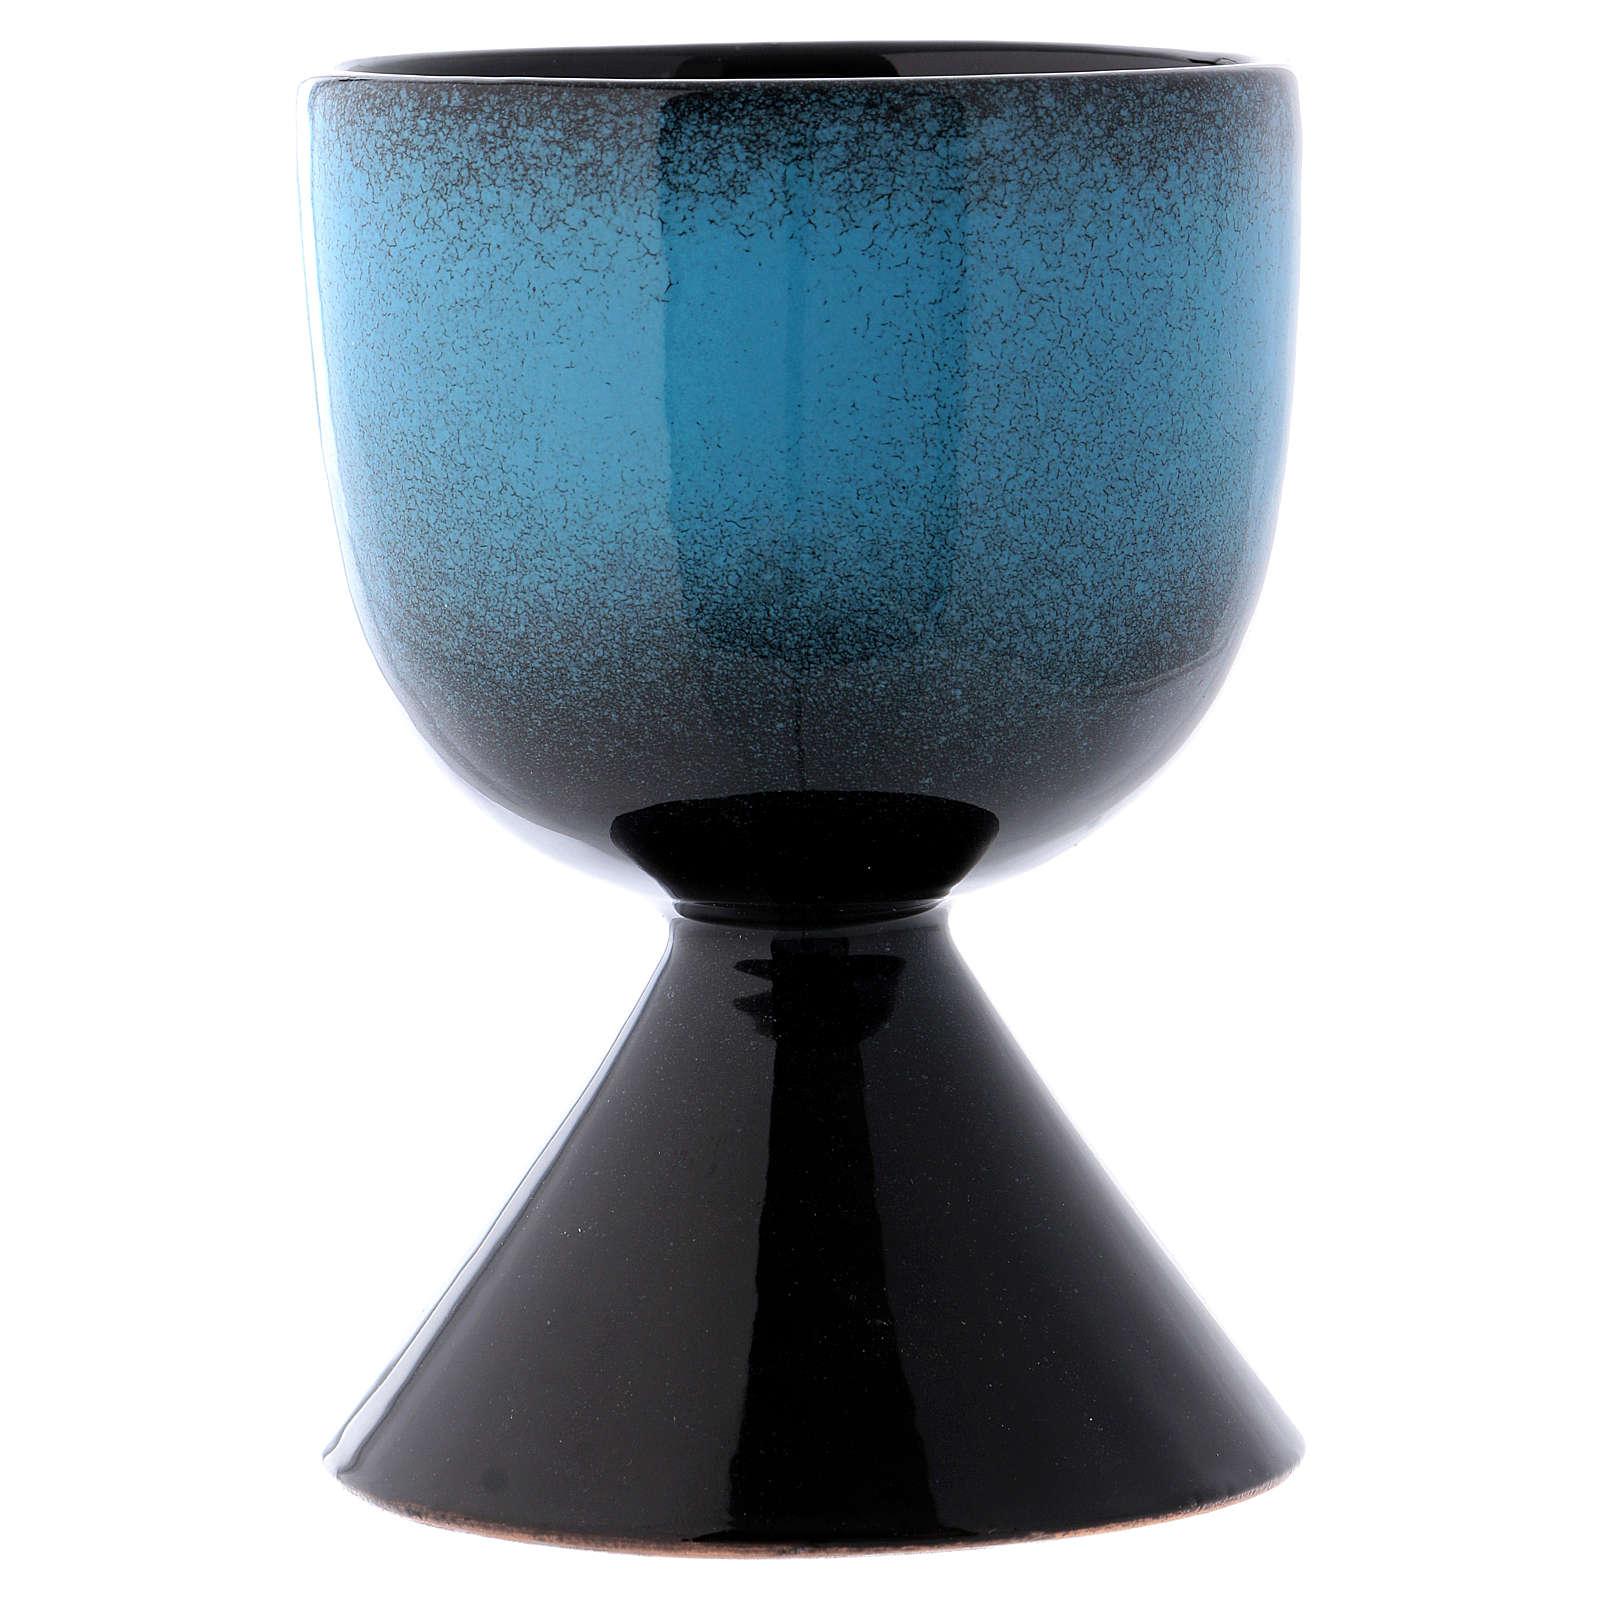 Cáliz de cerámica turquesa símbolo mariano 4